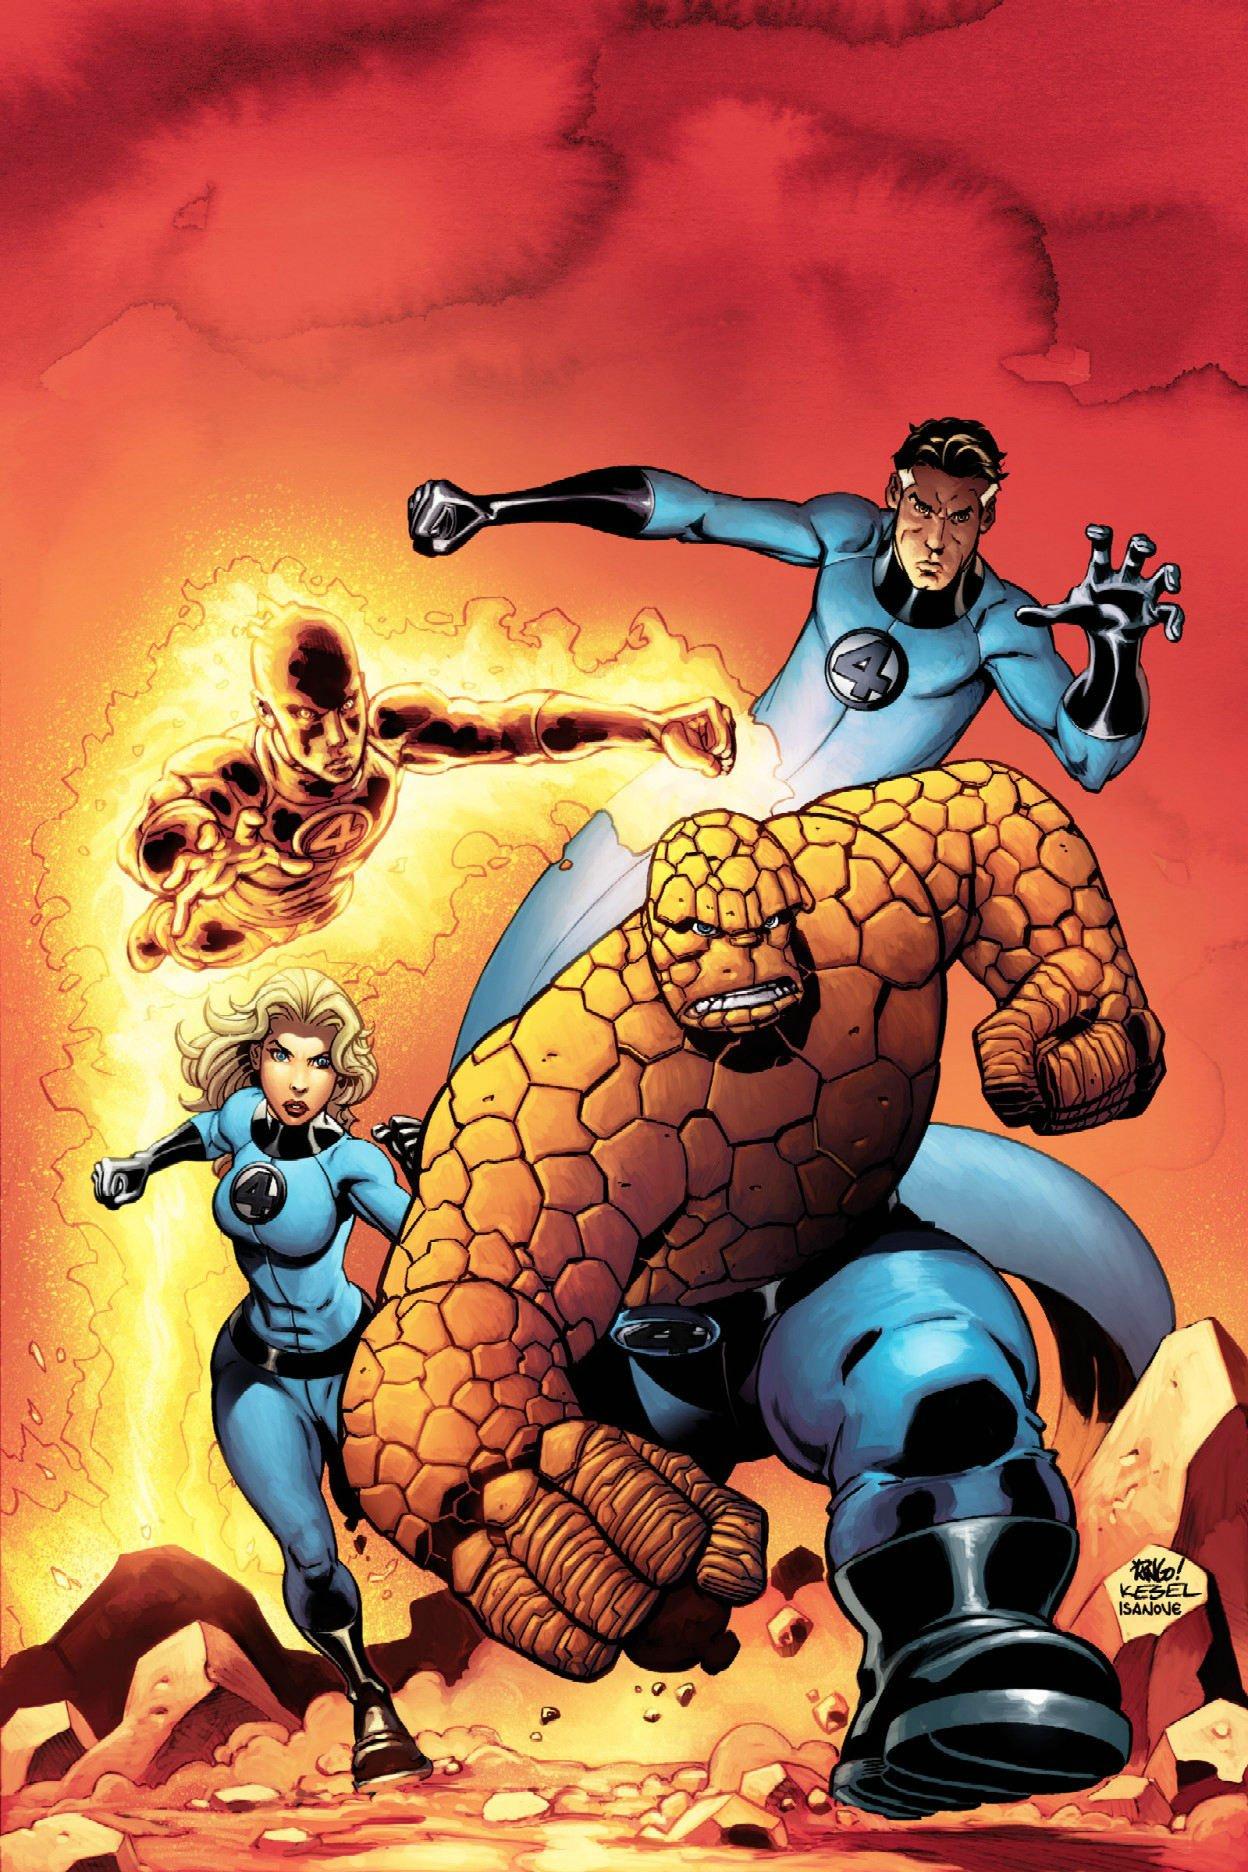 Amazon.com: Fantastic Four, Vol. 2 (9780785117759): Waid, Mark, Porter,  Howard, Wieringo, Mike: Books